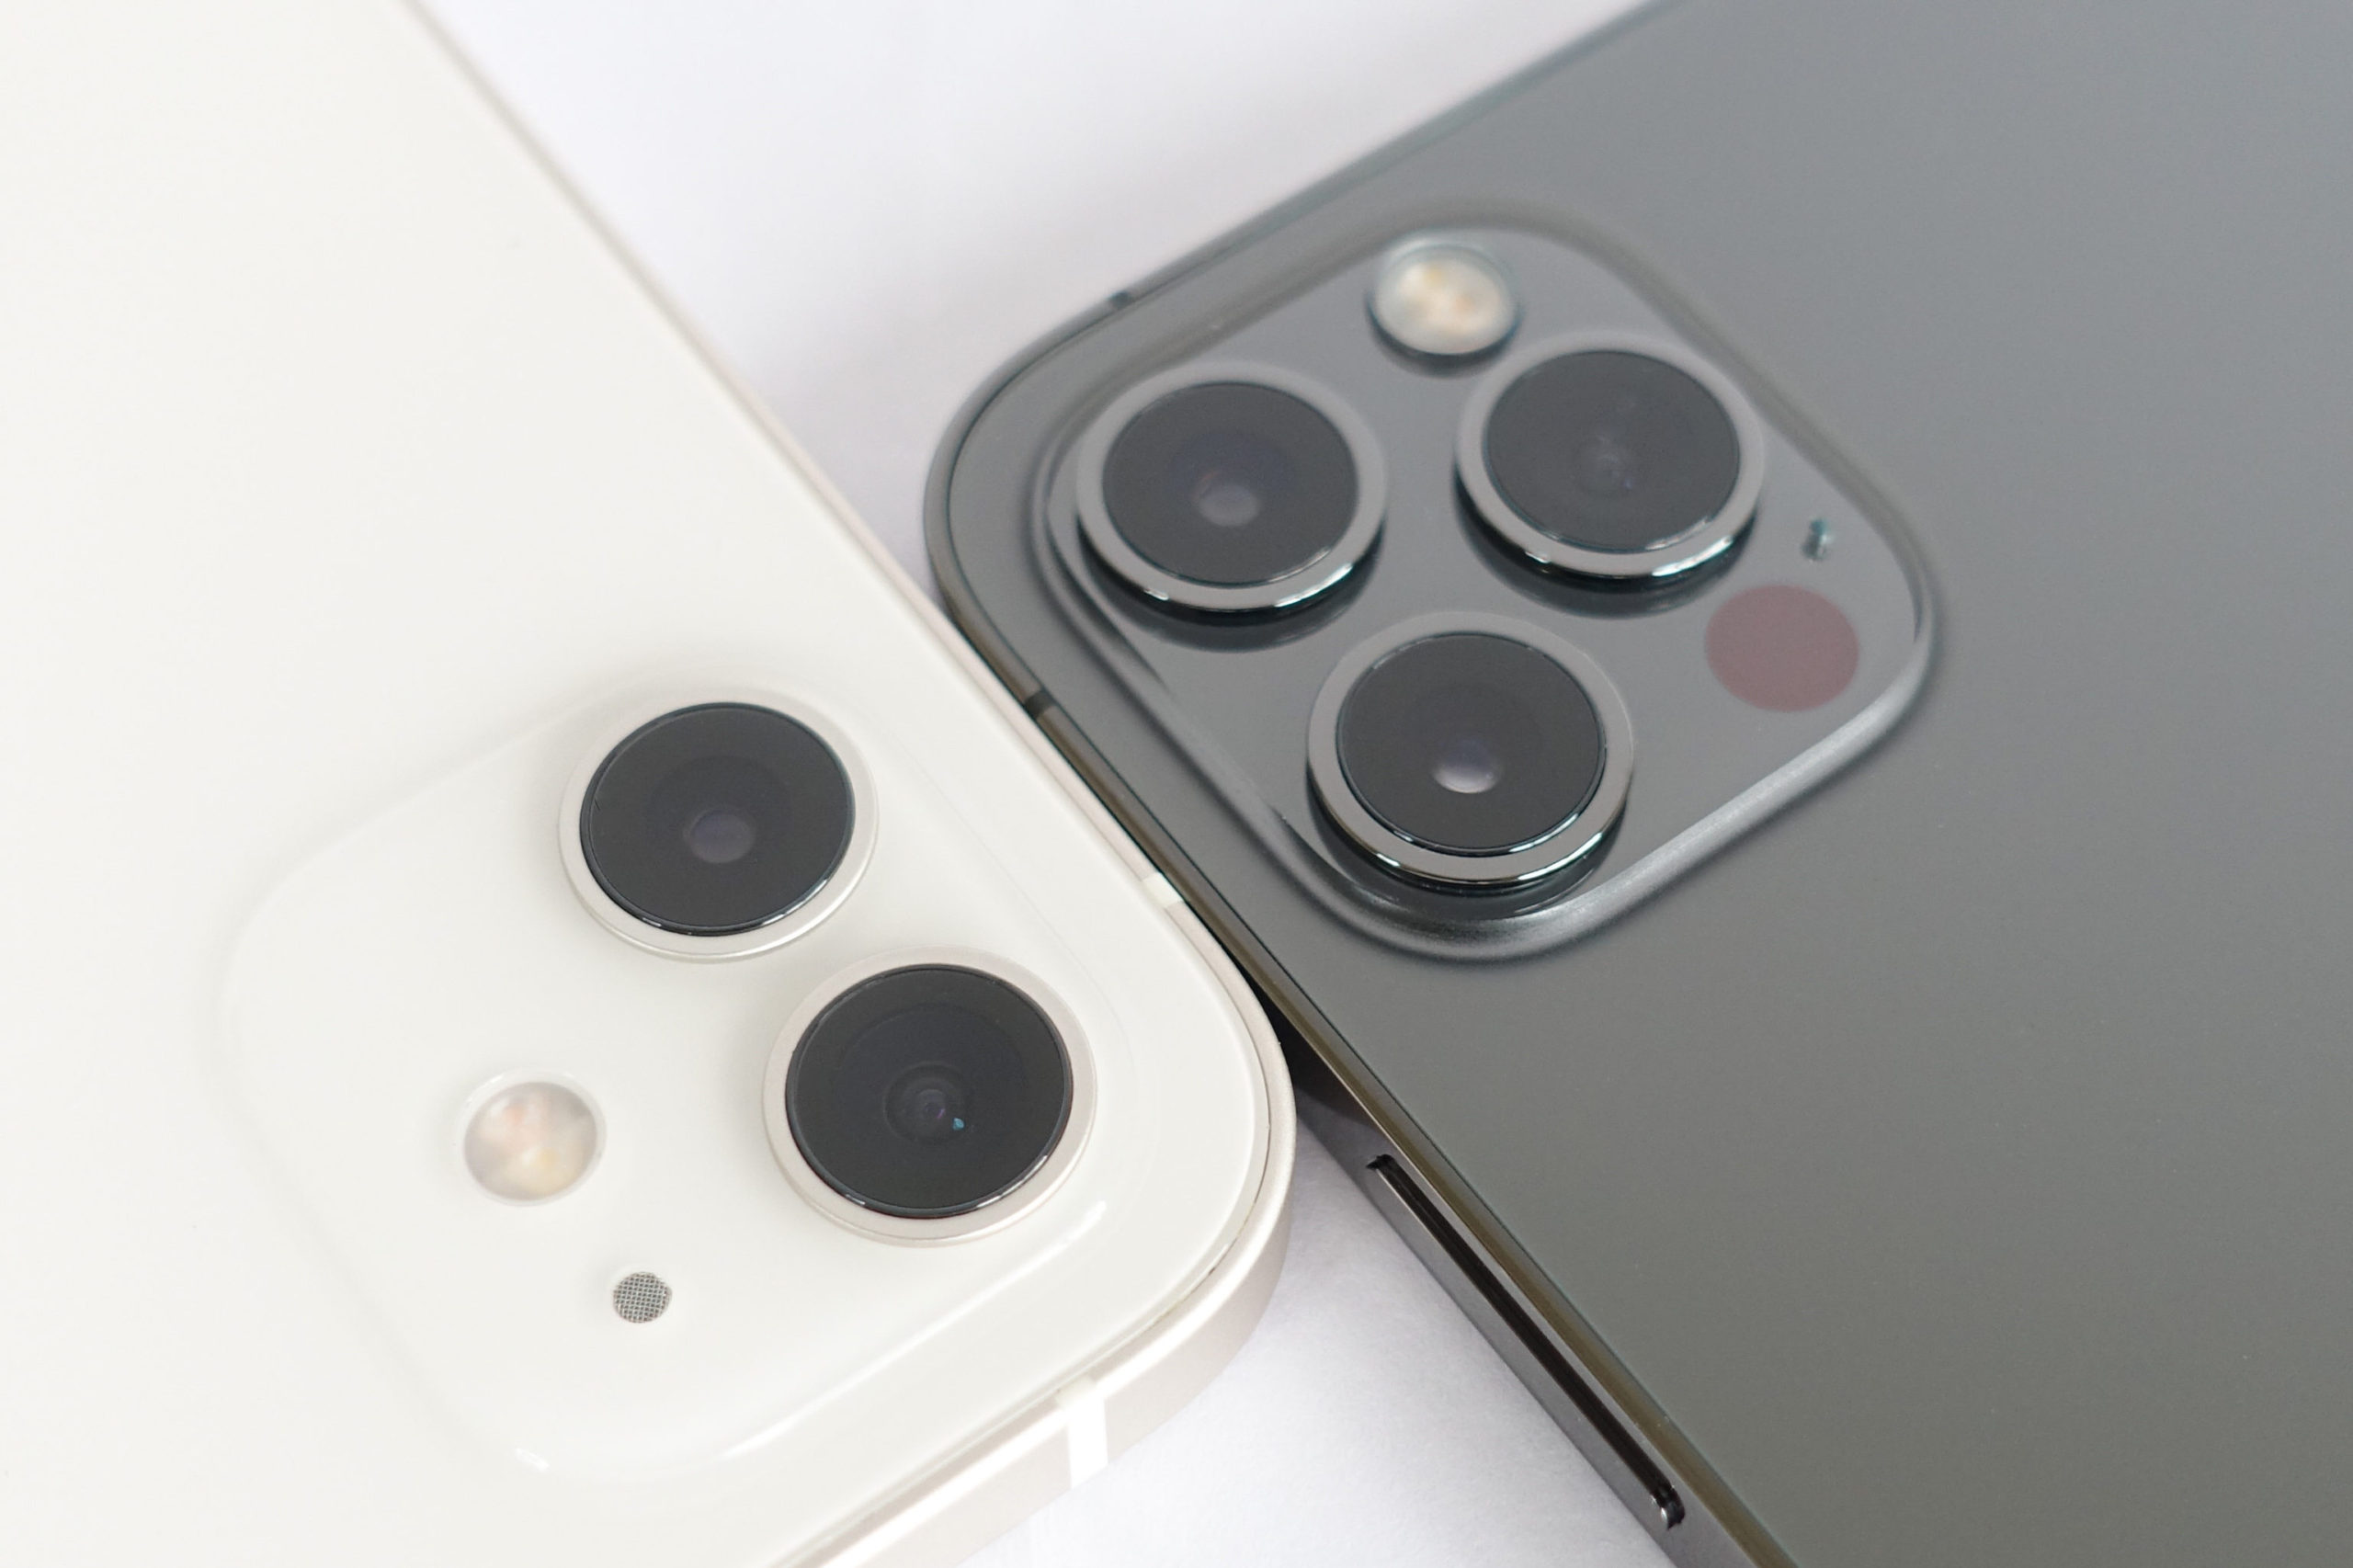 iPhone 12 / 12 Proの画像